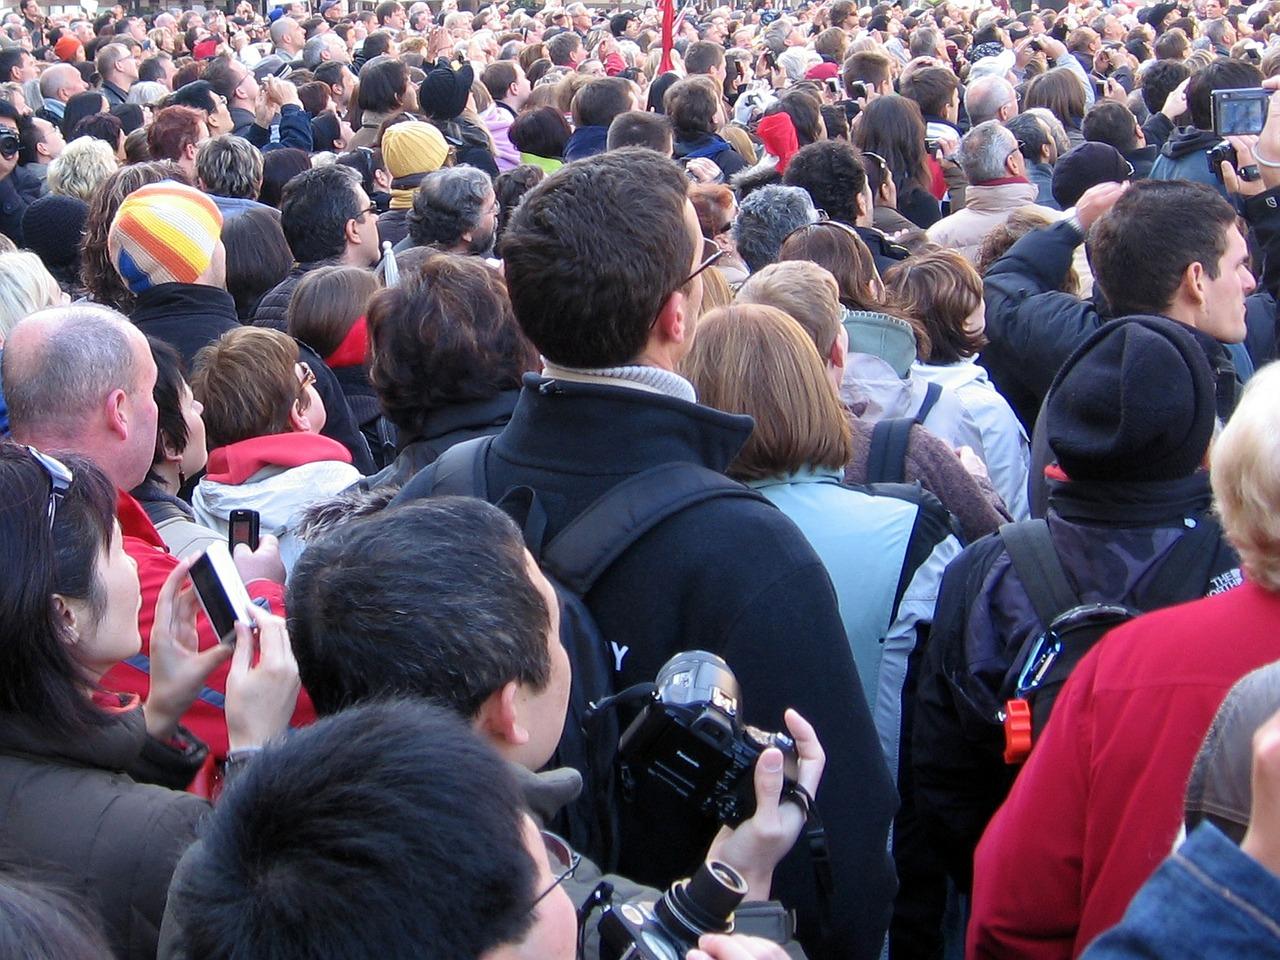 Teil 2: ISEK 2030 im demografischen Wandel